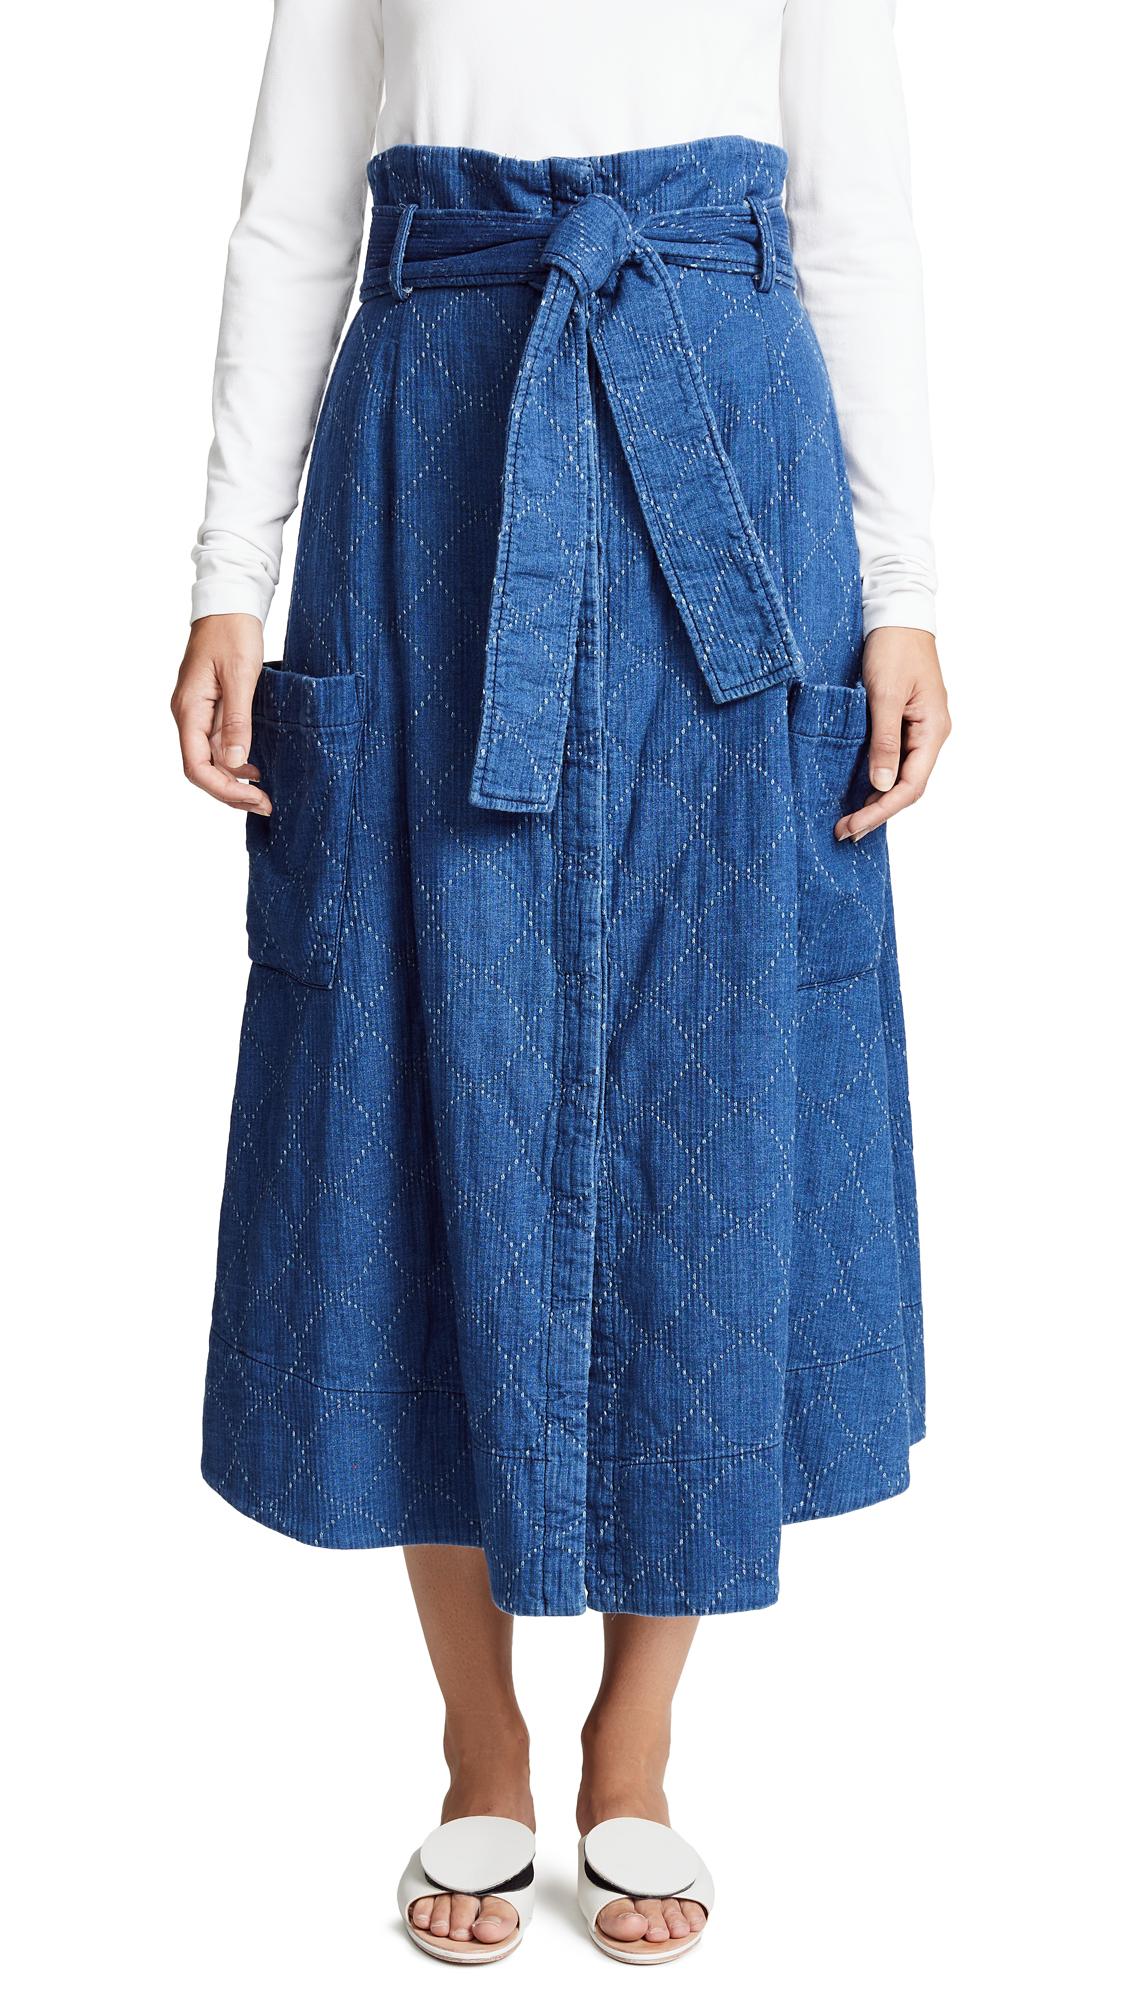 WHIT Pocket Skirt in Indigo